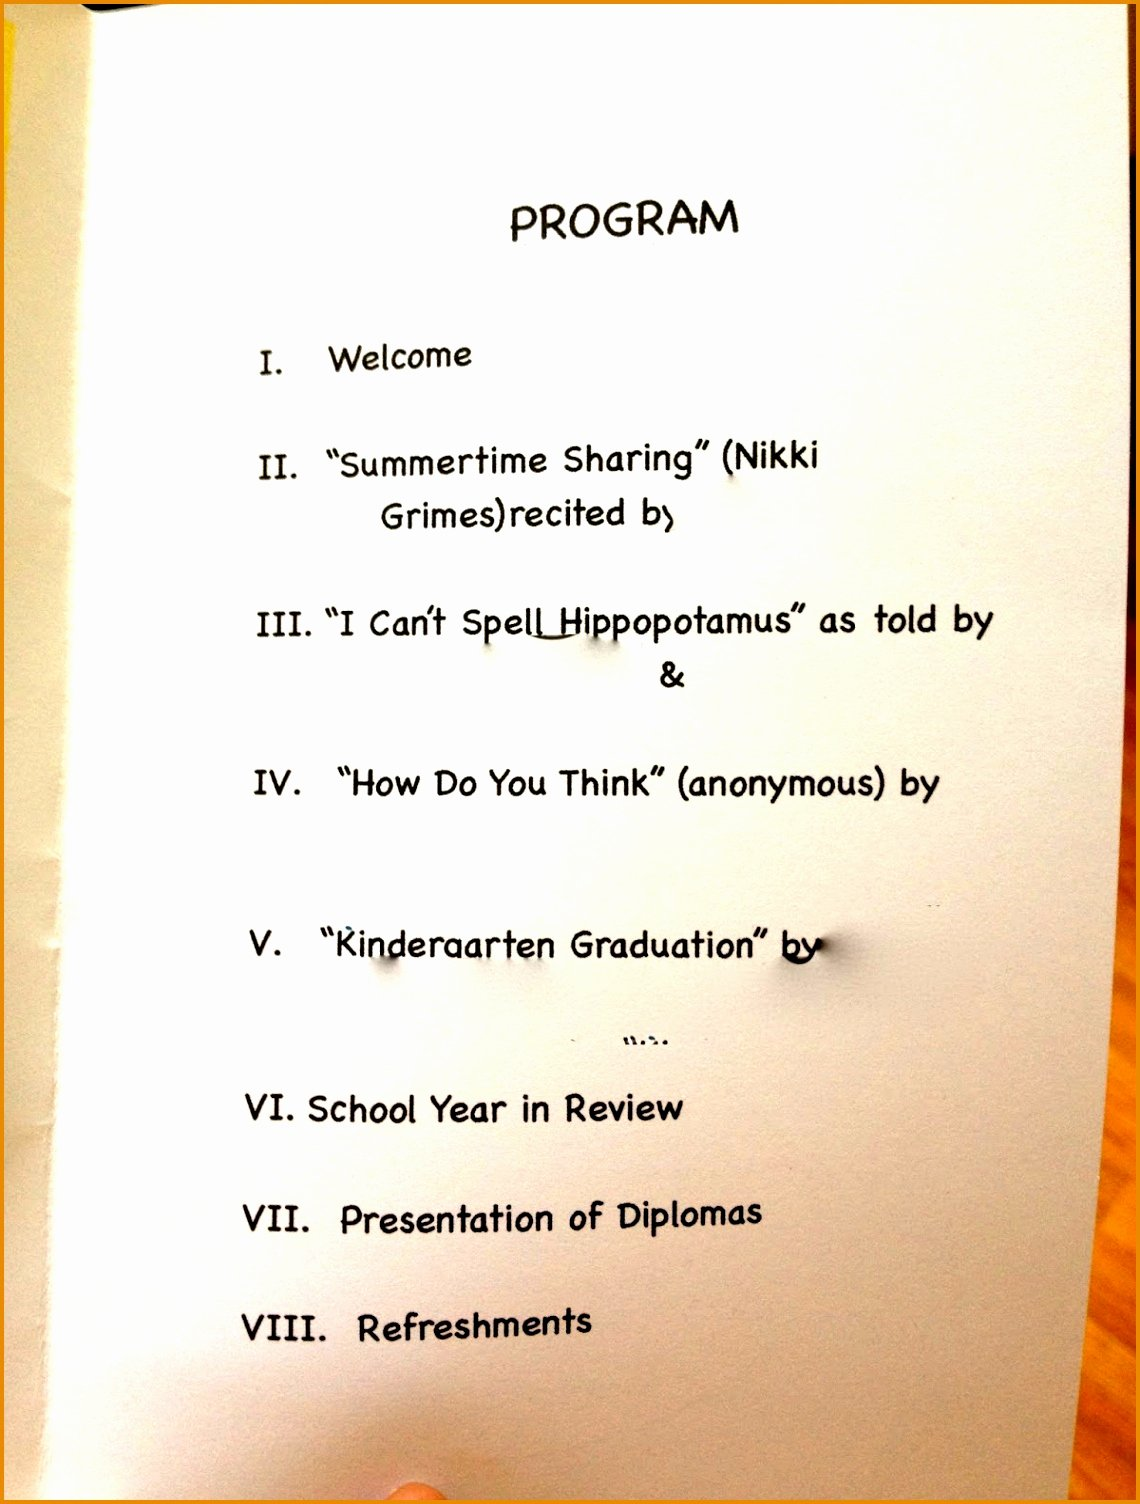 Preschool Graduation Program Template Lovely Preschool Graduation Programs Template Hashtag Bg